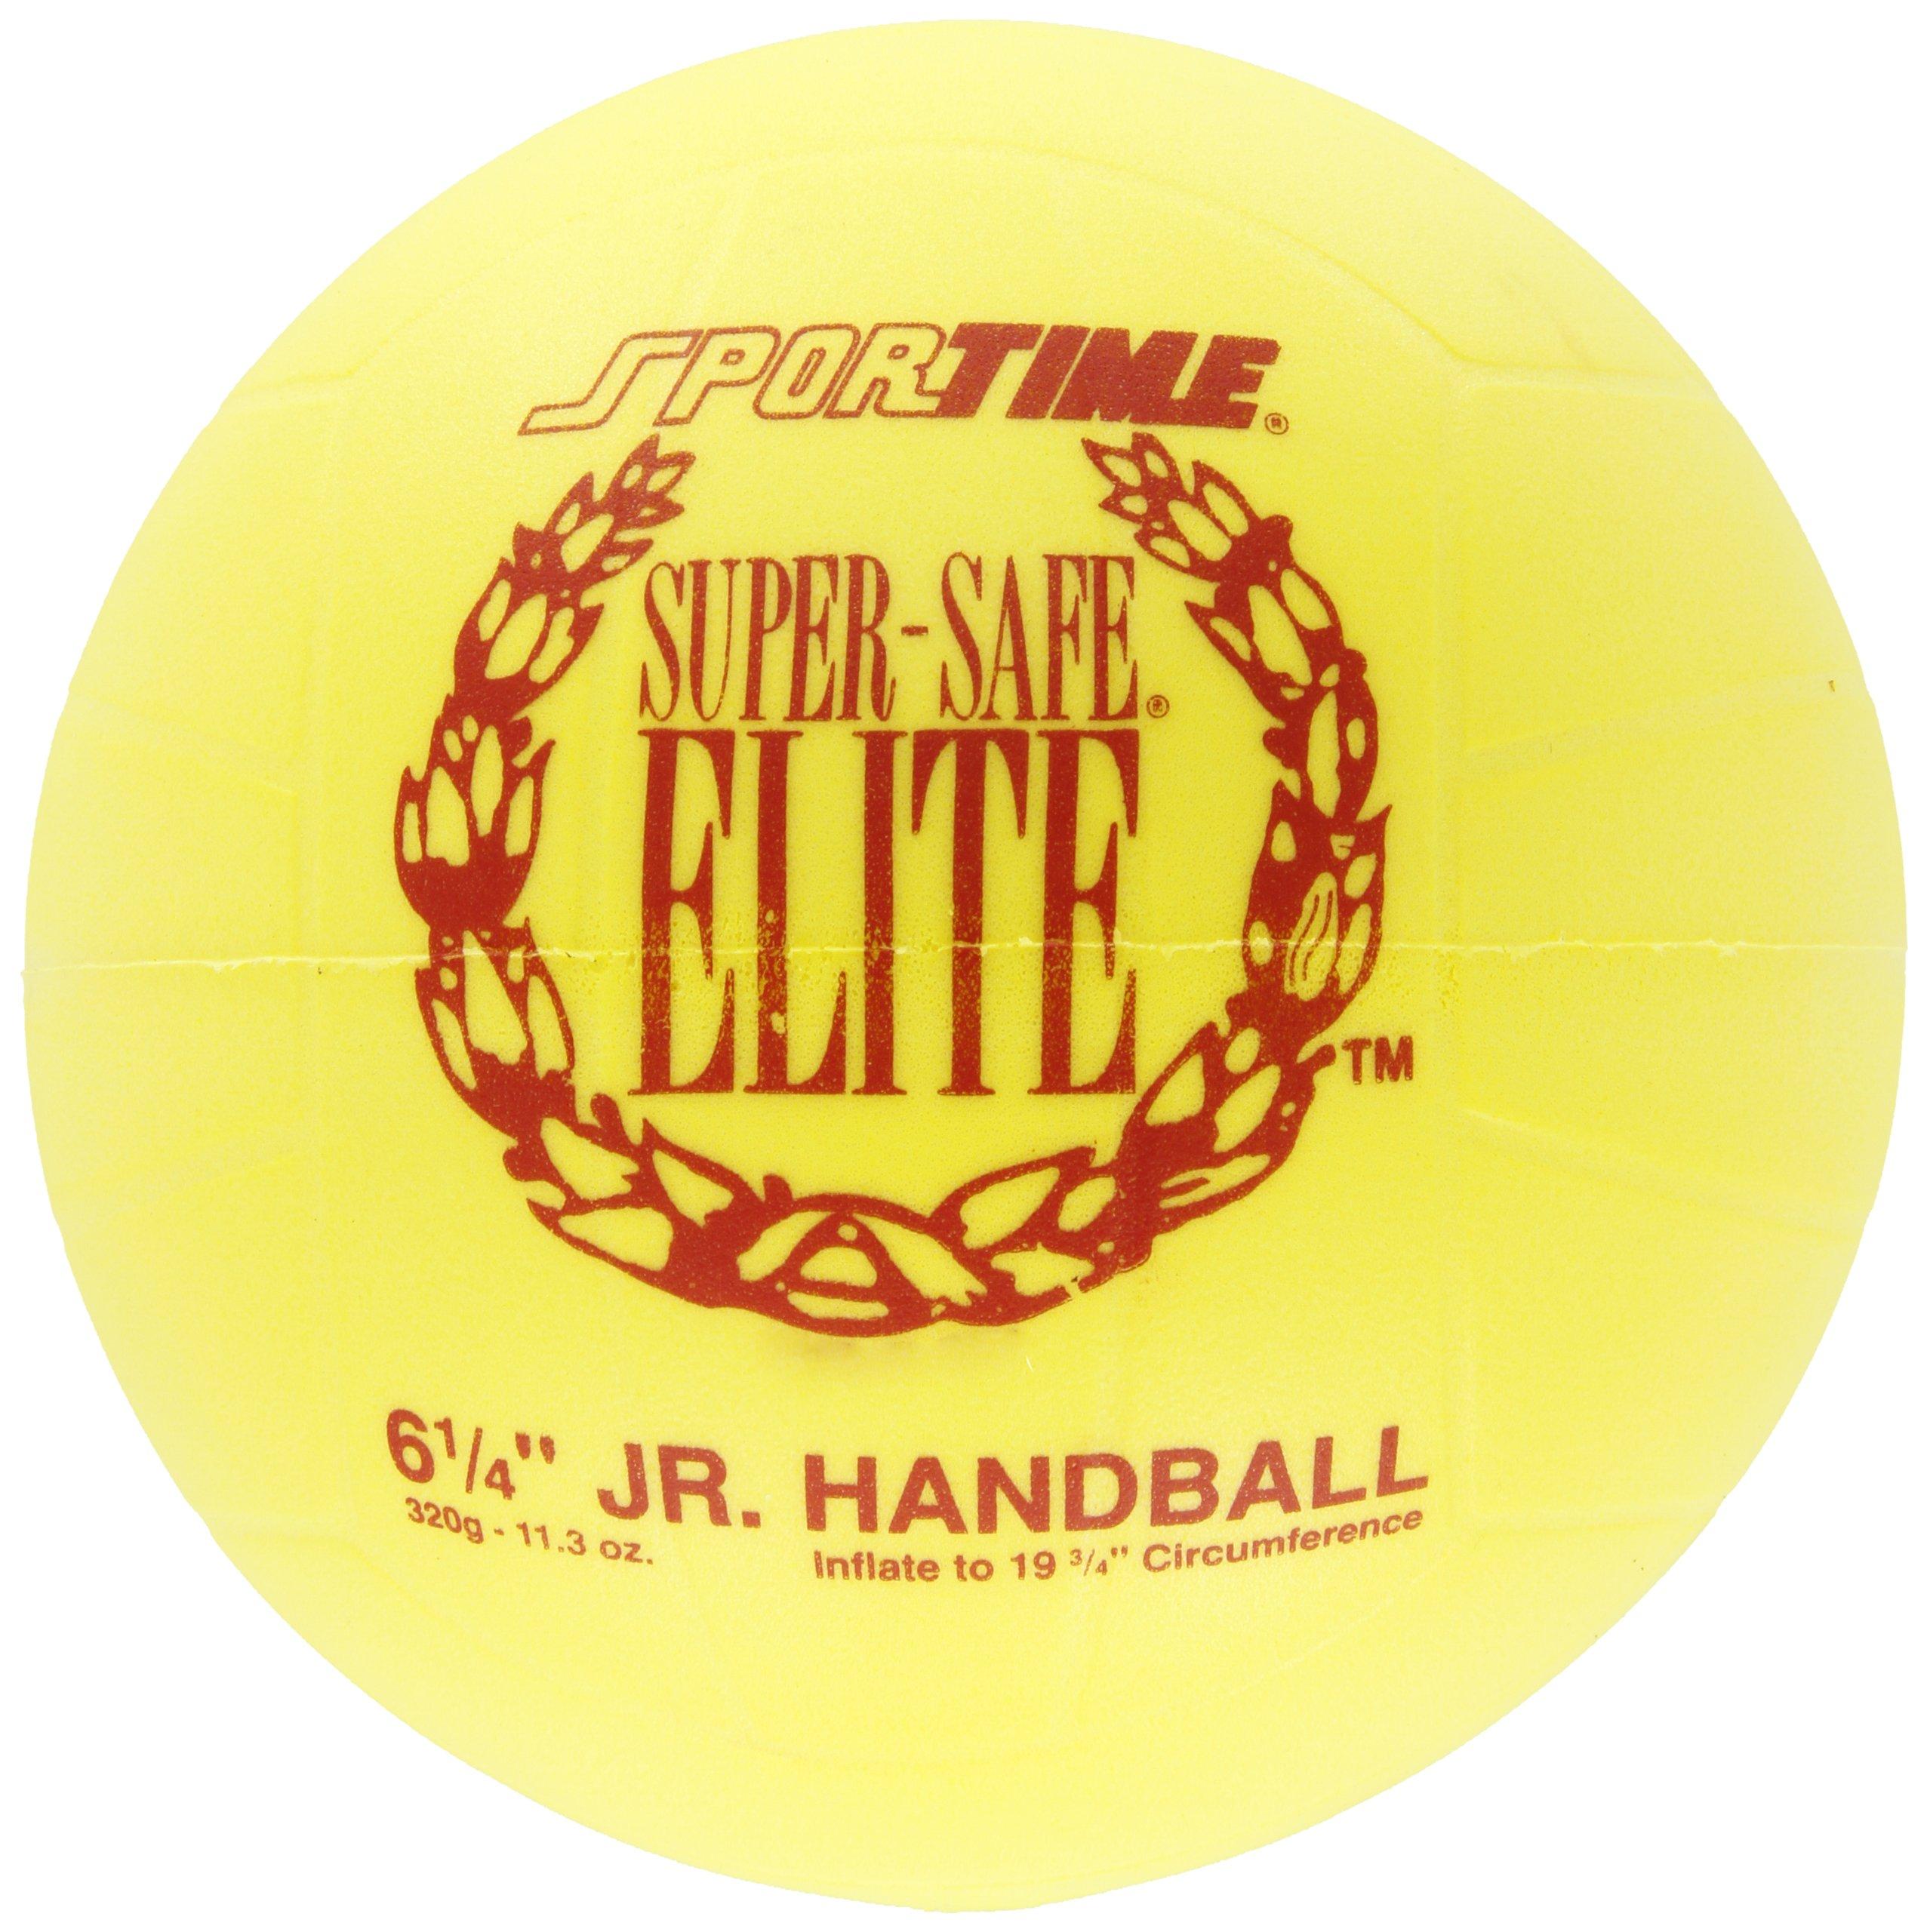 Sportime Super-Safe Elite Junior Team Handball - 6 1/4 inch by Sportime